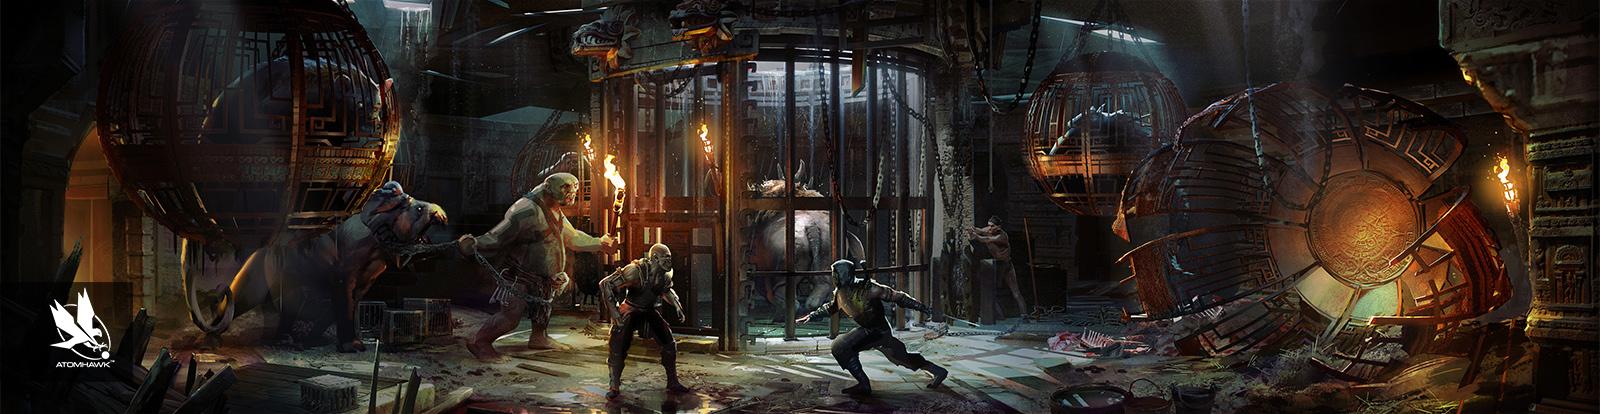 Atomhawk_Warner-Bros-NetherRealm_Mortal-Kombat-11_Concept-Art_Environment-Design_Bestiary_Night.jpg